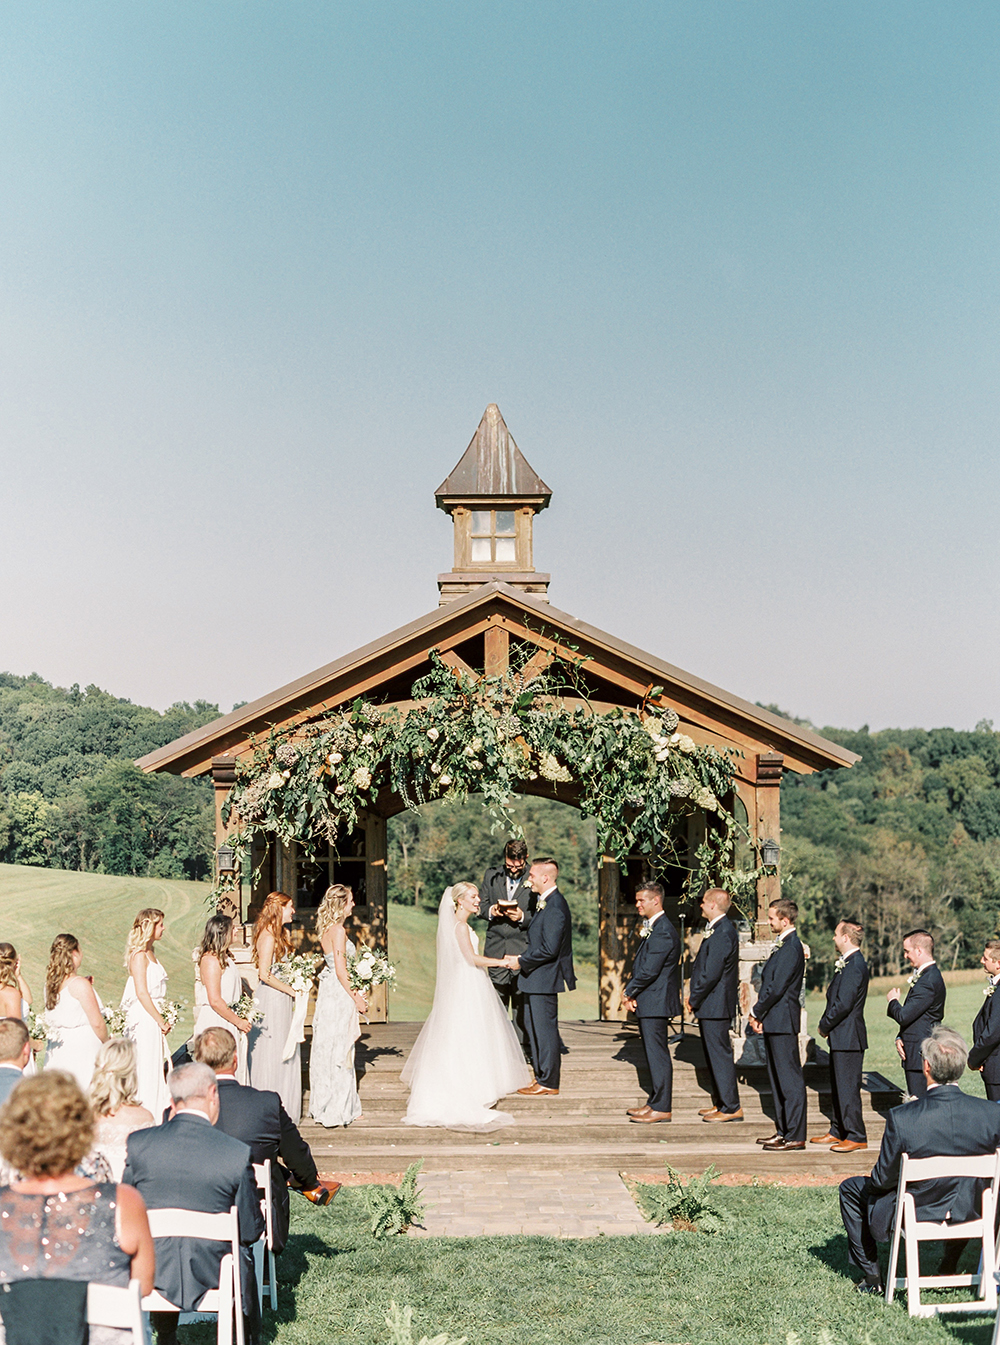 brewery wedding venues outdoor ceremony pavilion